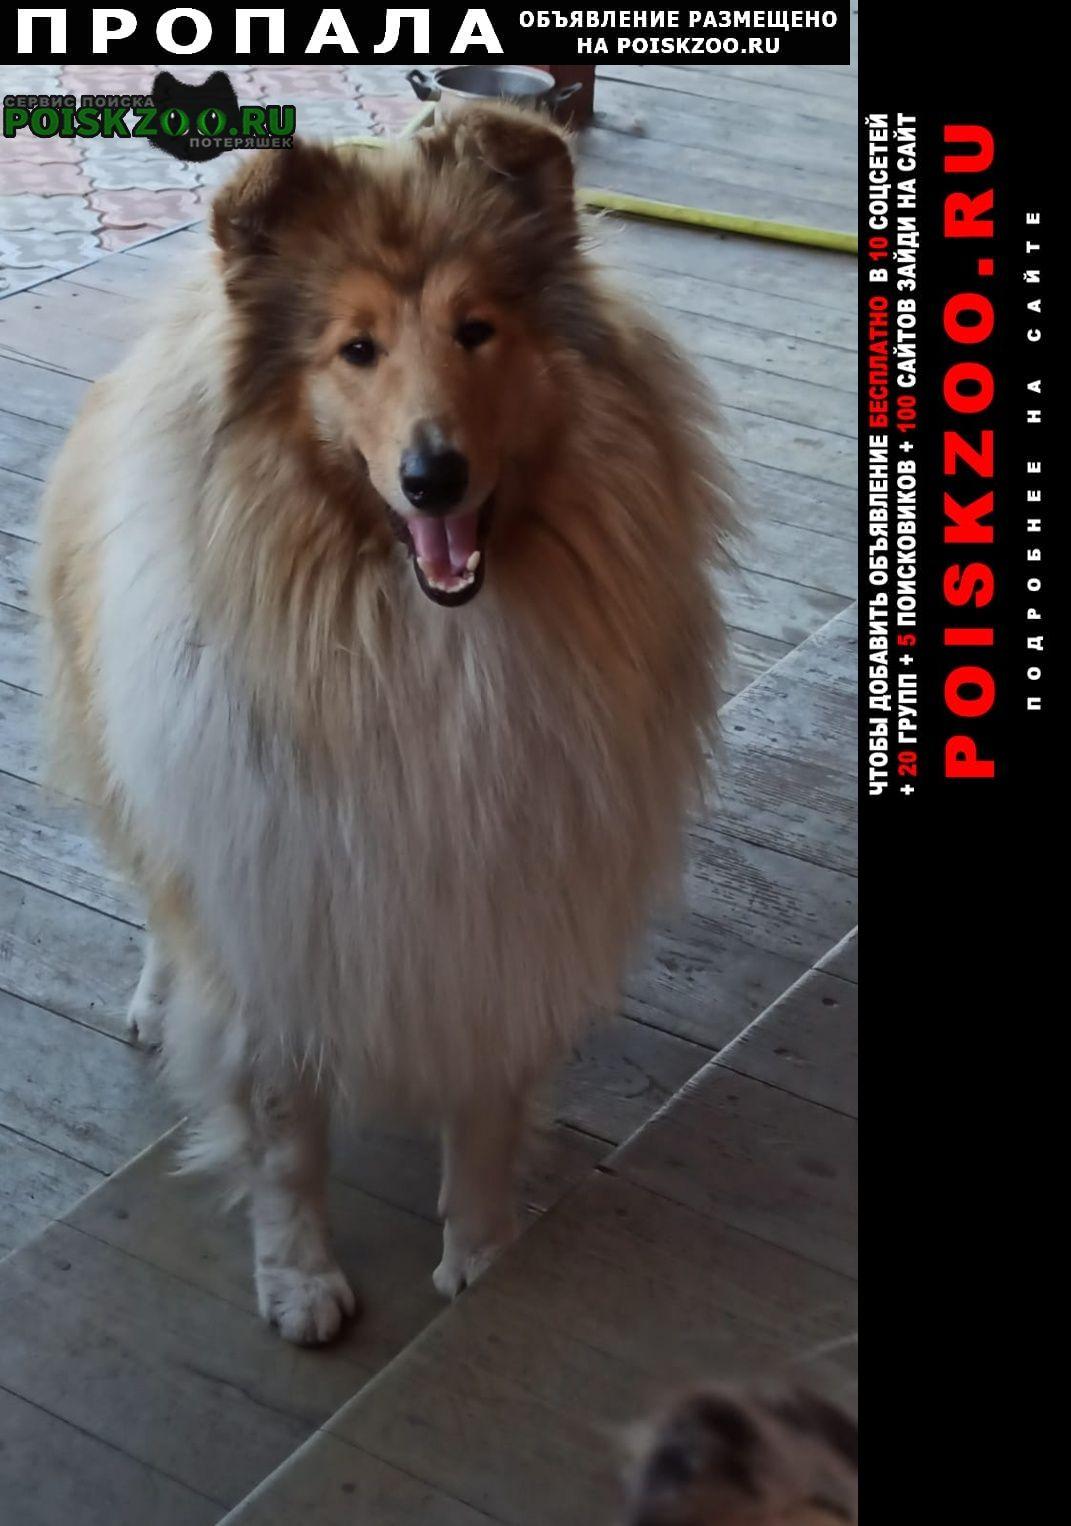 Пропала собака помогите Екатеринбург